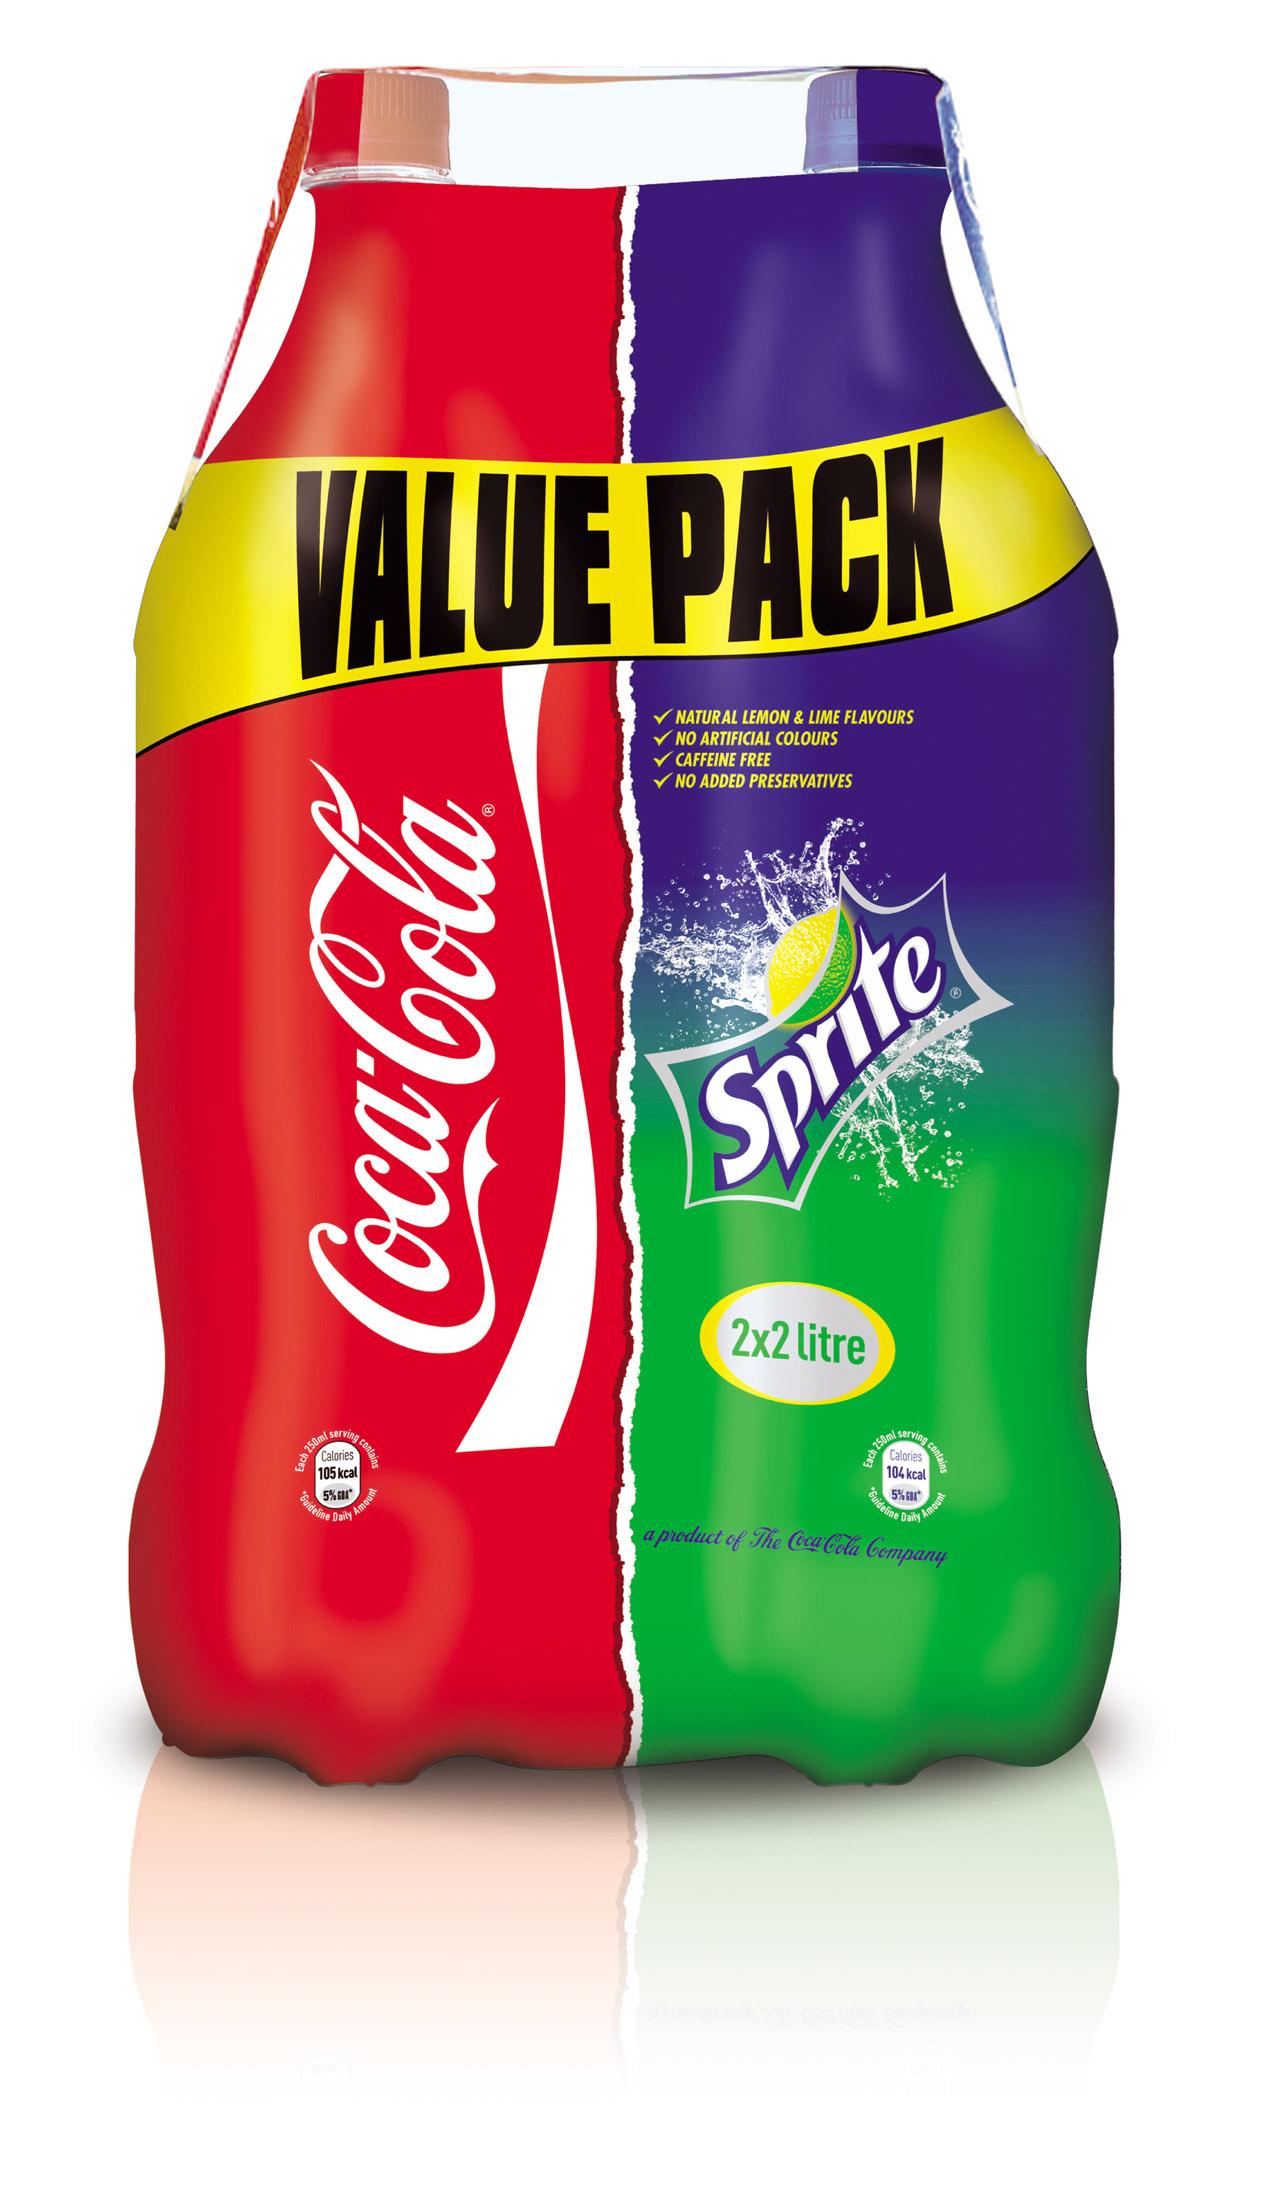 2x2L KO-SP value pack   Courtney & Nelson LTD